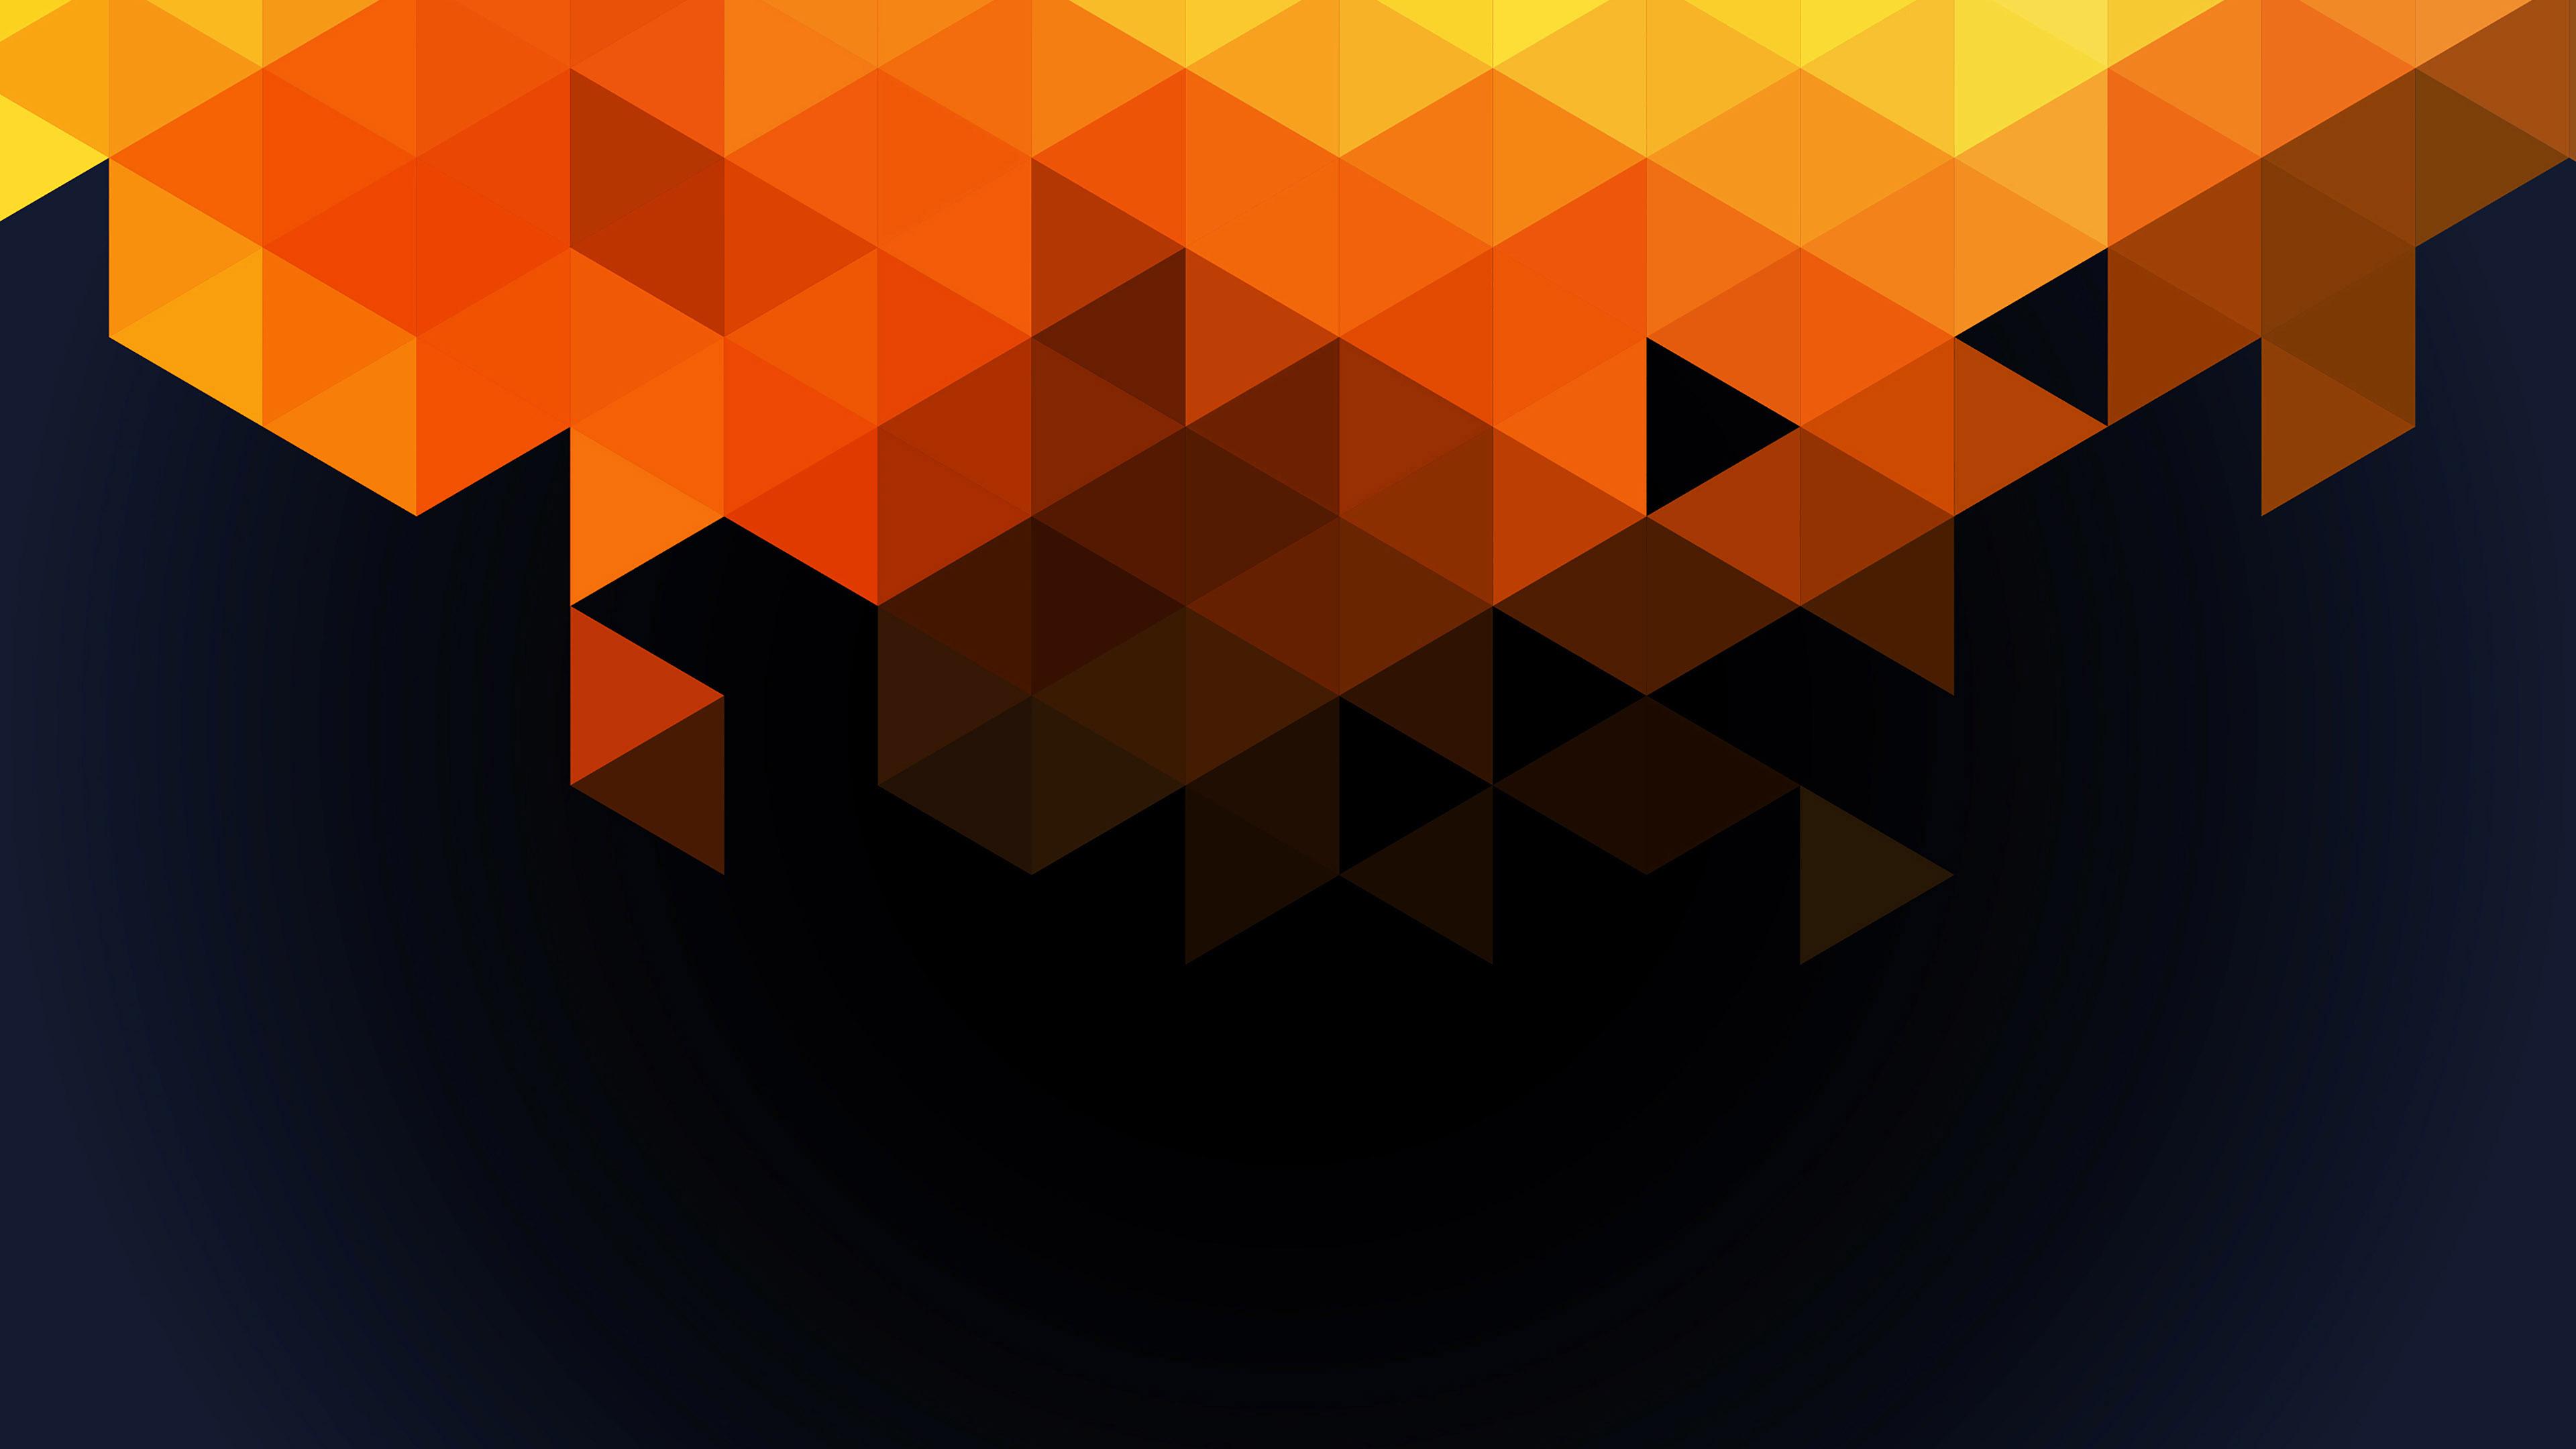 Cute Iphone 7 Plus Wallpaper Va92 Wallpaper Triangle Fall Orange Pattern Wallpaper